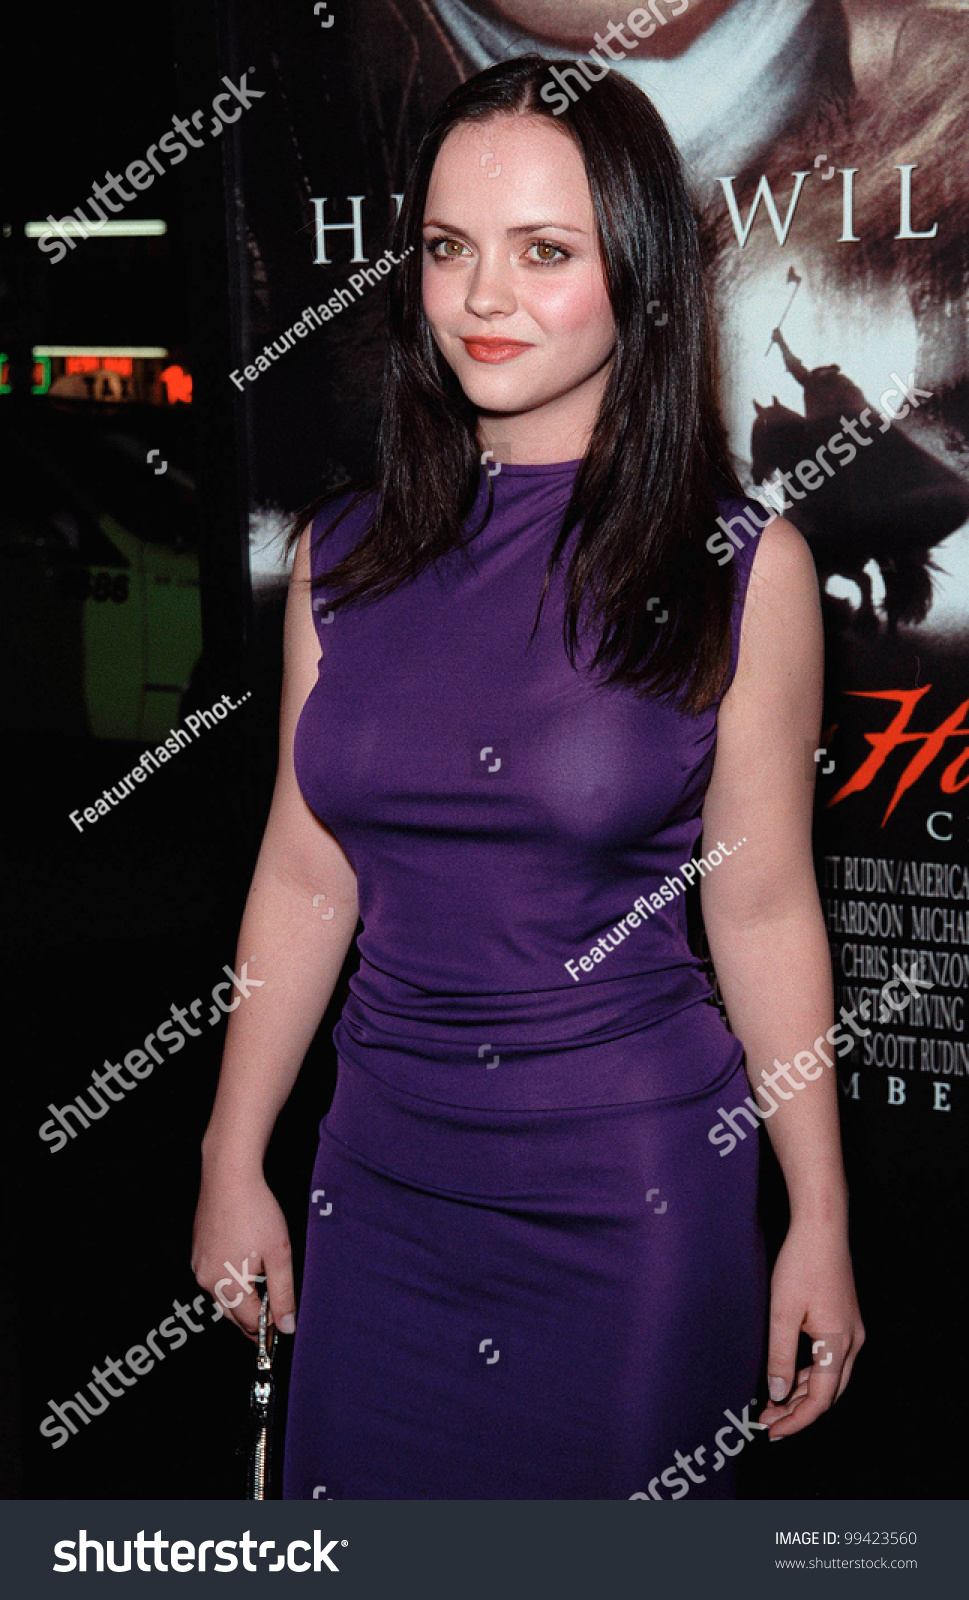 17nov99 actress christina ricci world premiere stock photo